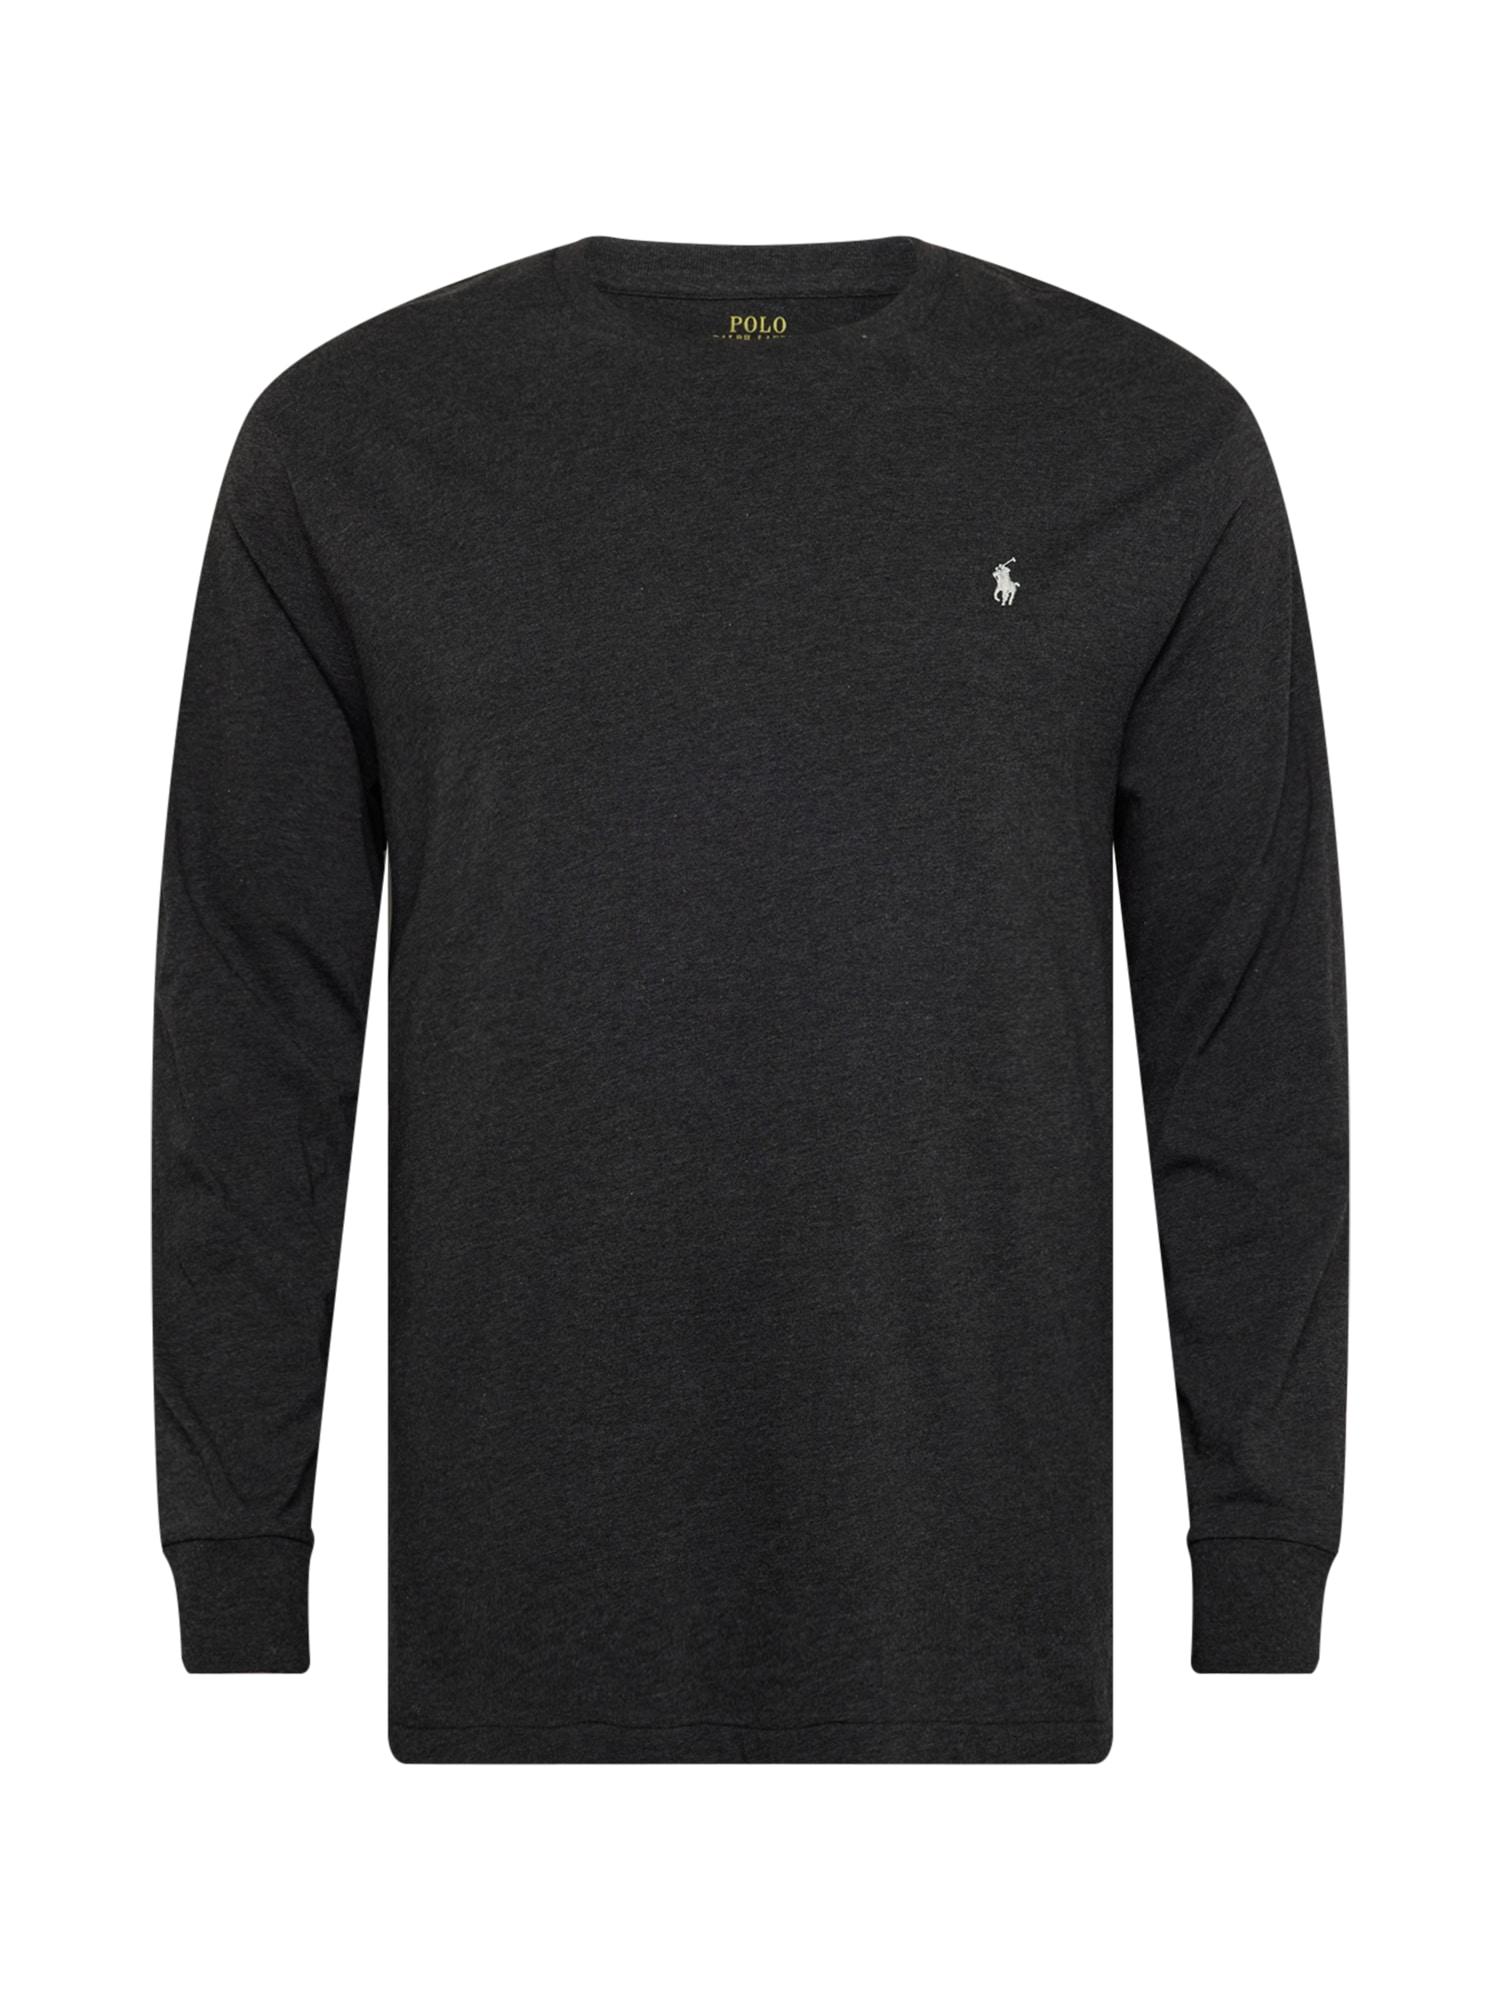 Polo Ralph Lauren Big & Tall Marškinėliai juoda / balta